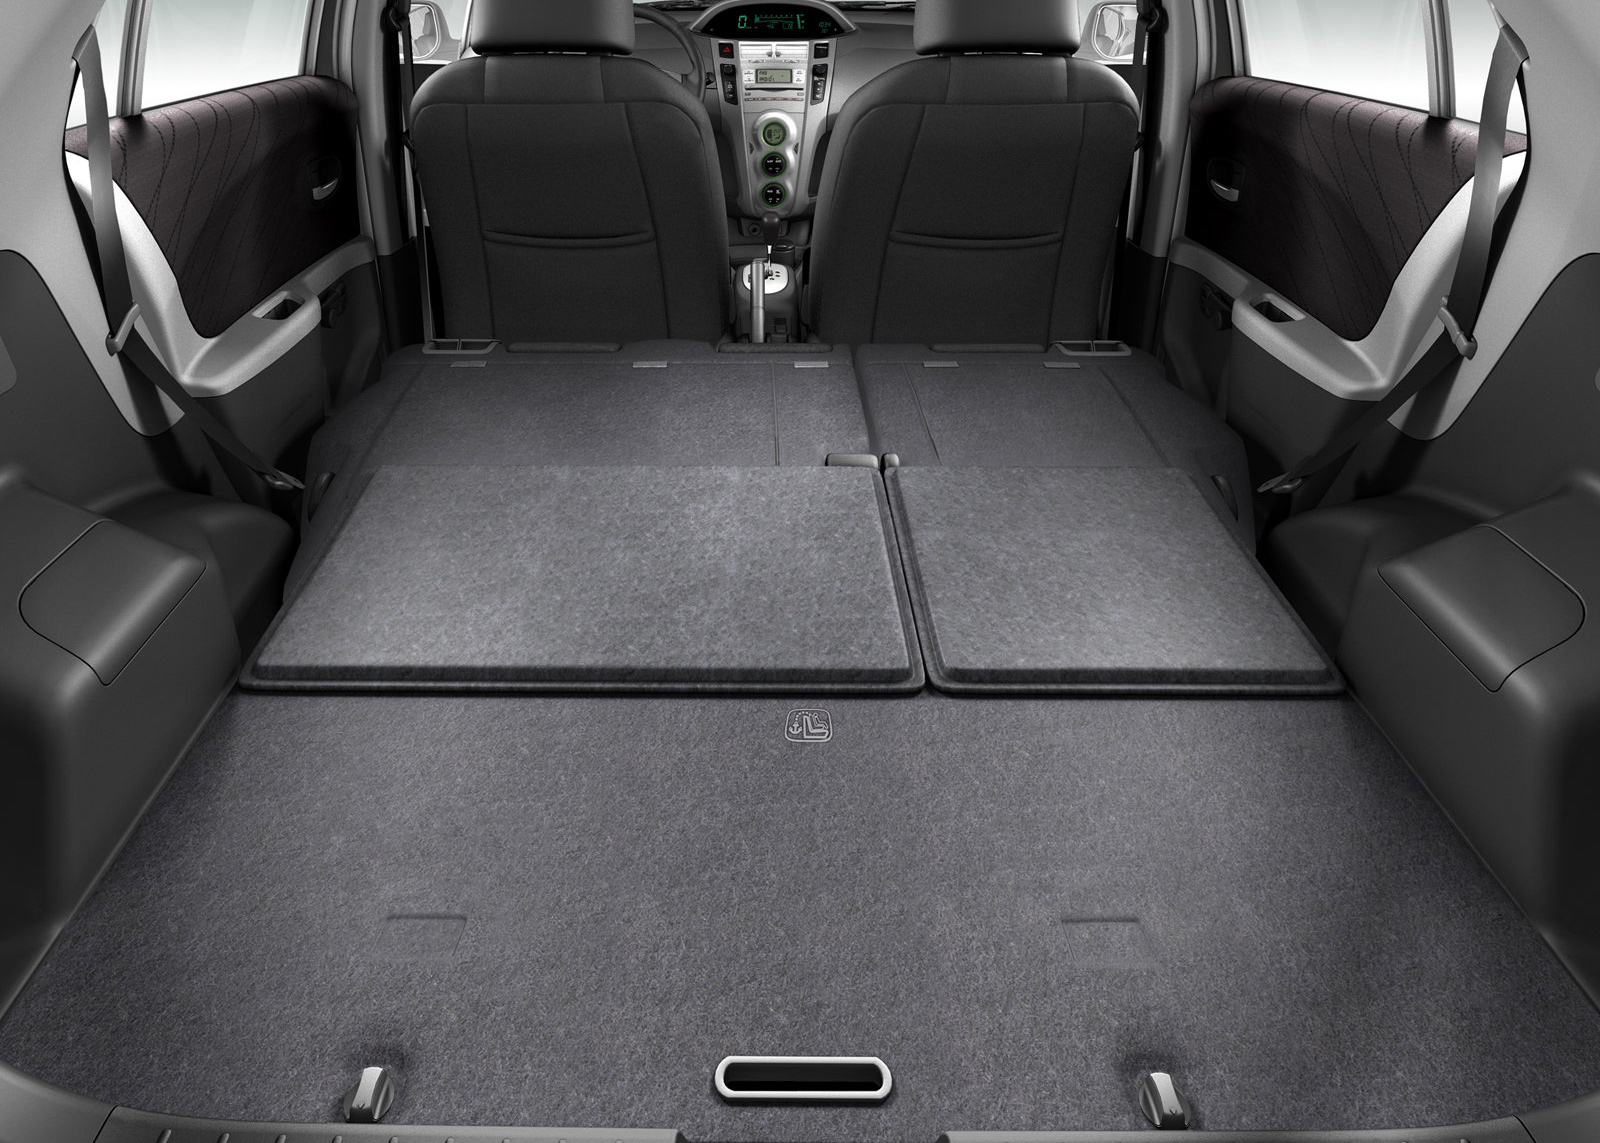 Toyota vitz bootspace